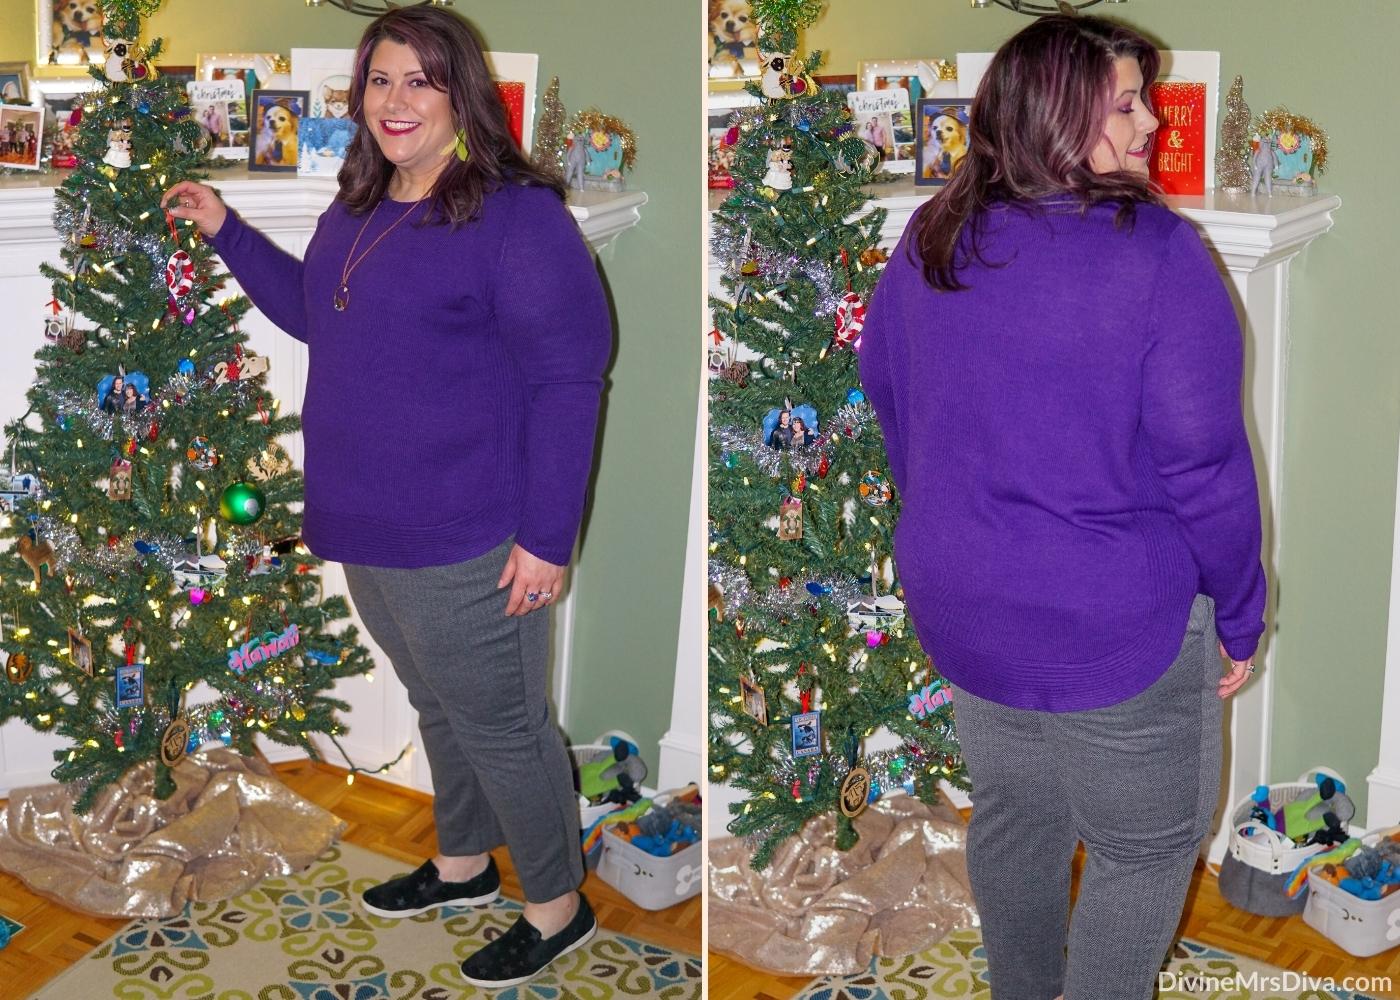 Shades of purple for a casual winter ensemble -  DivineMrsDiva.com #psblogger #plussize #styleblogger #plussizeblogger #plussizefashion #psootd #ootd #plussizeclothing #outfit #style #40style #40plusblogger #FallStyle #WinterStyle #LaneBryant #CreateYourLane #Torrid #FeelTheFit